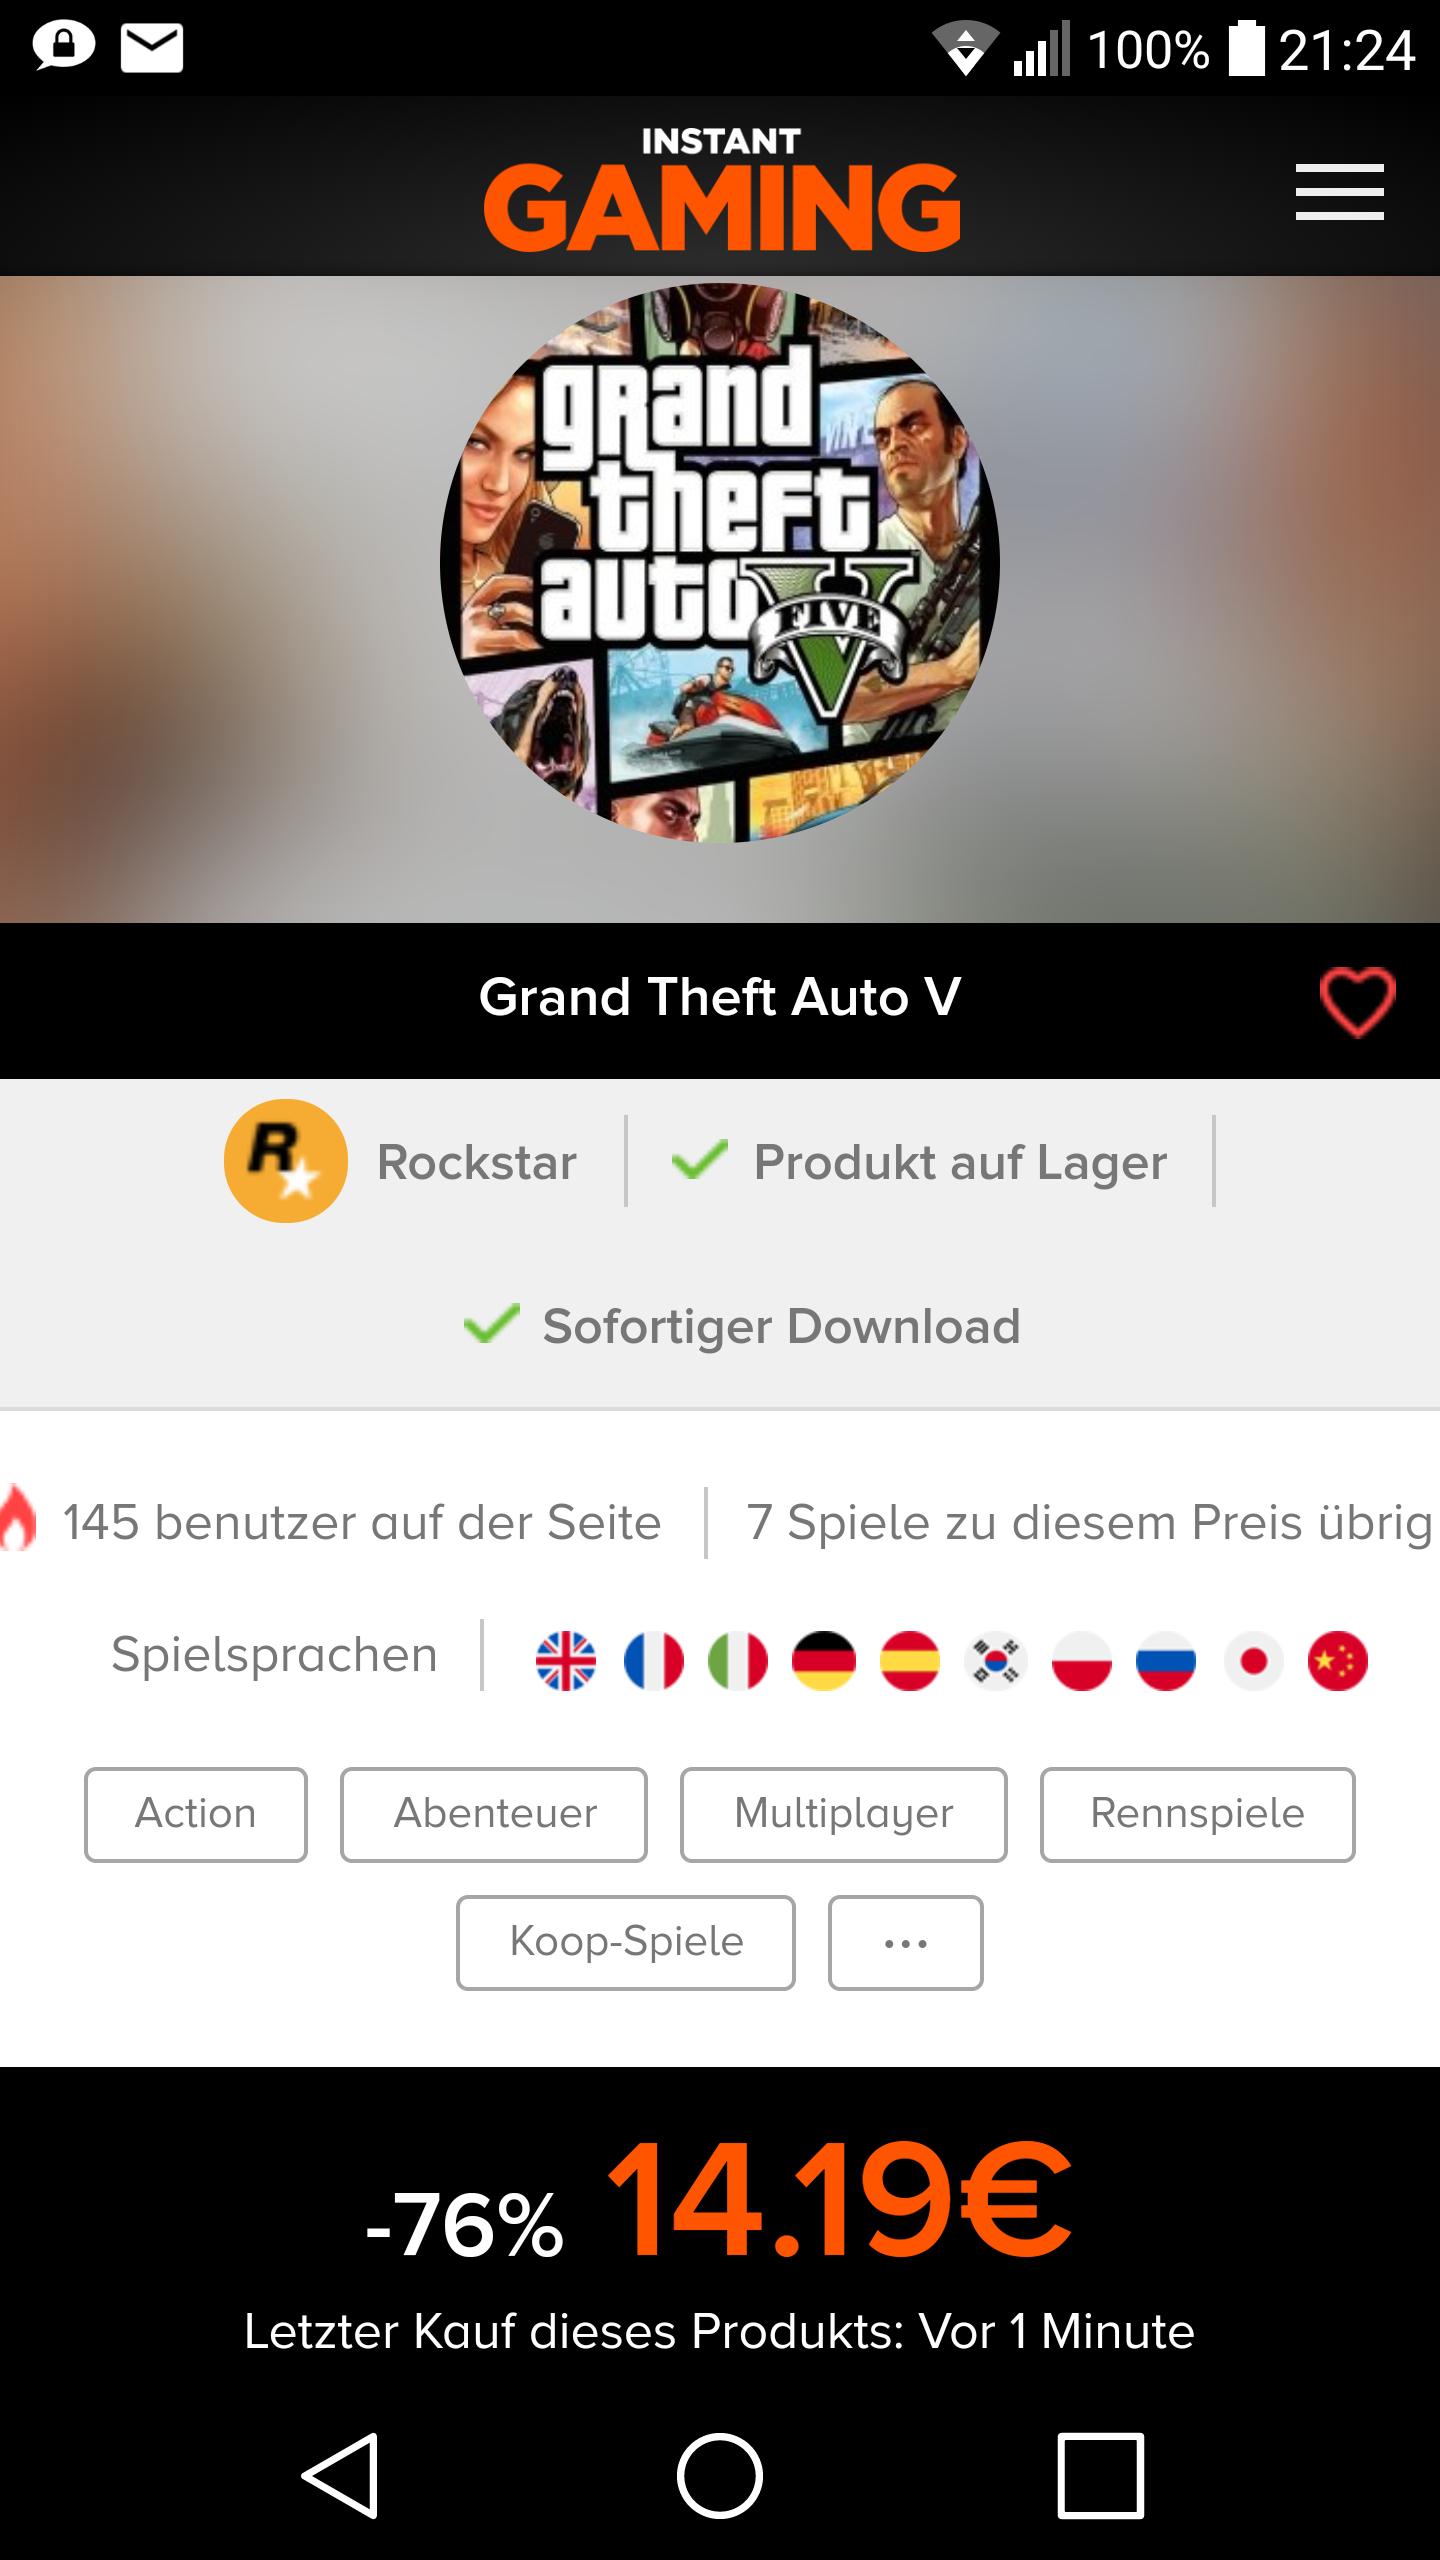 GTA V - BEI INSTANT-GAMING NUR 14€